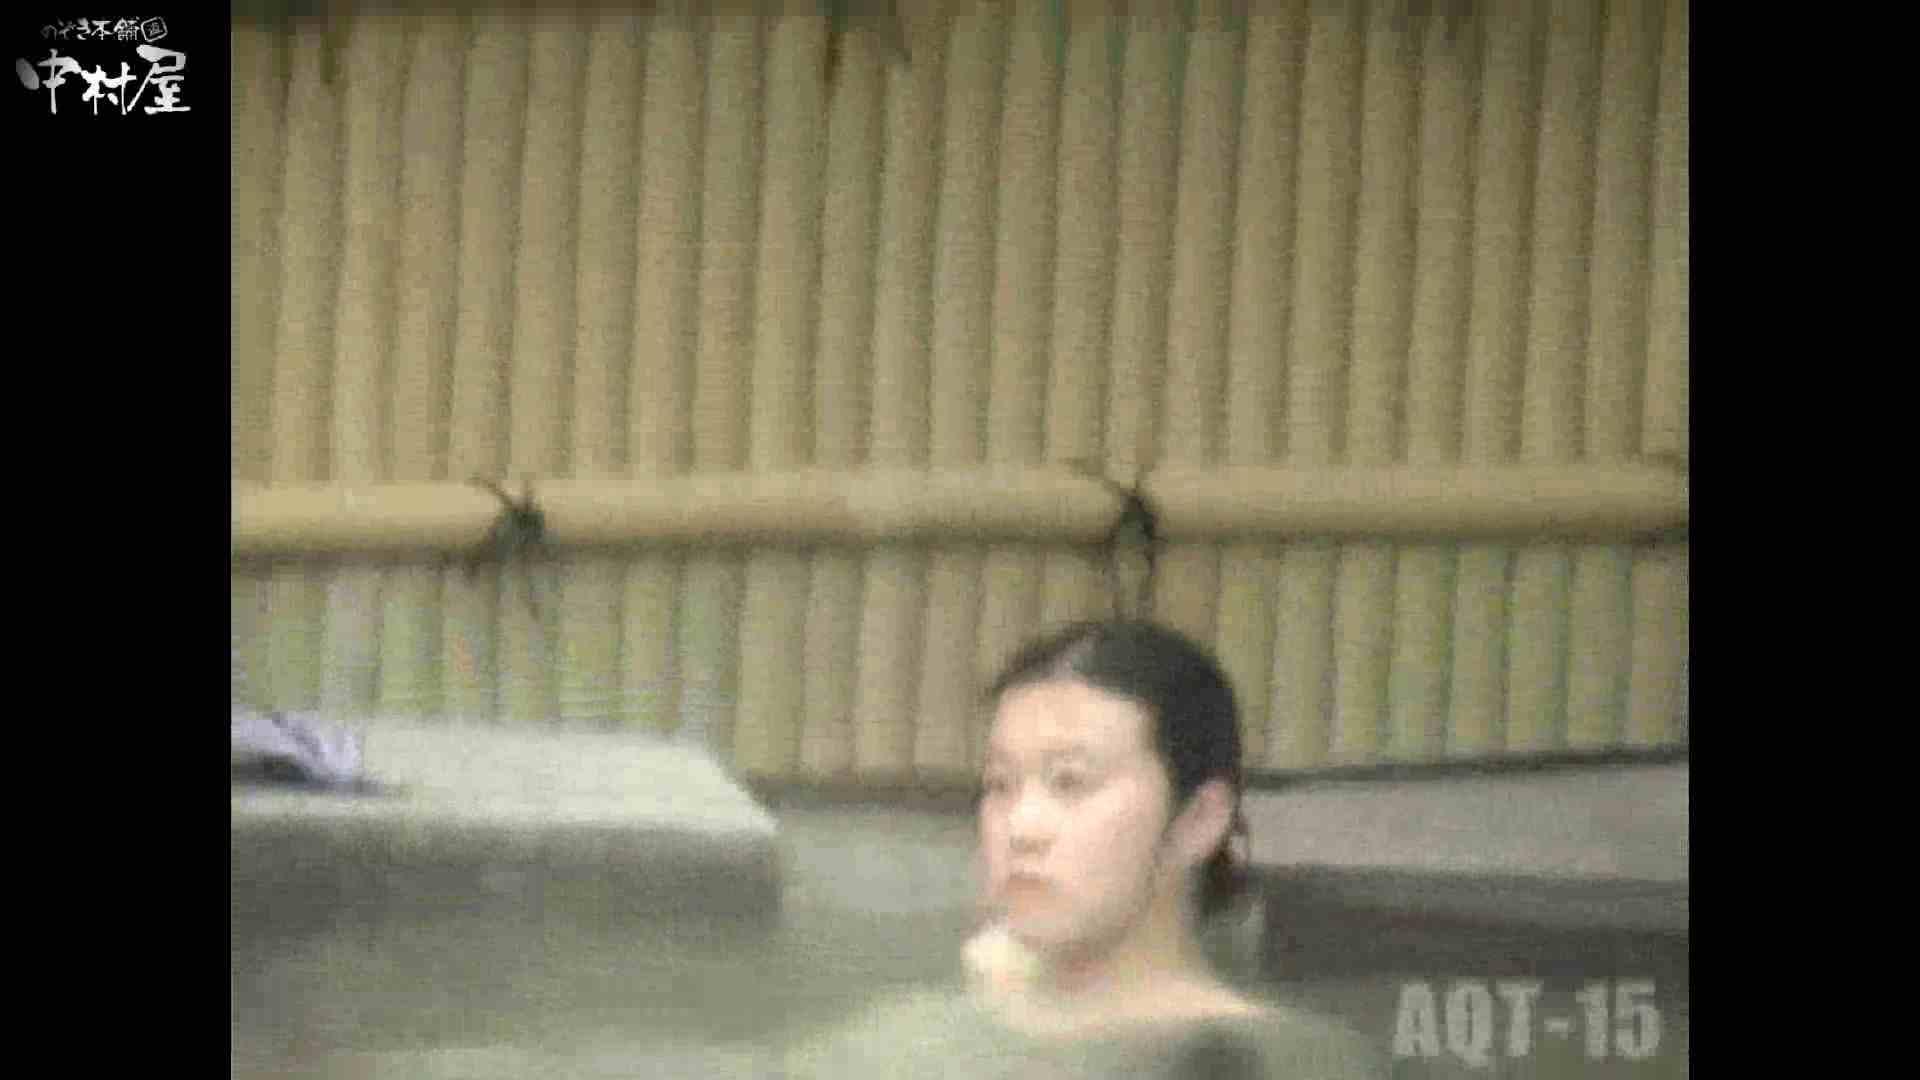 Aquaな露天風呂Vol.878潜入盗撮露天風呂十五判湯 其の三 潜入 性交動画流出 108連発 62